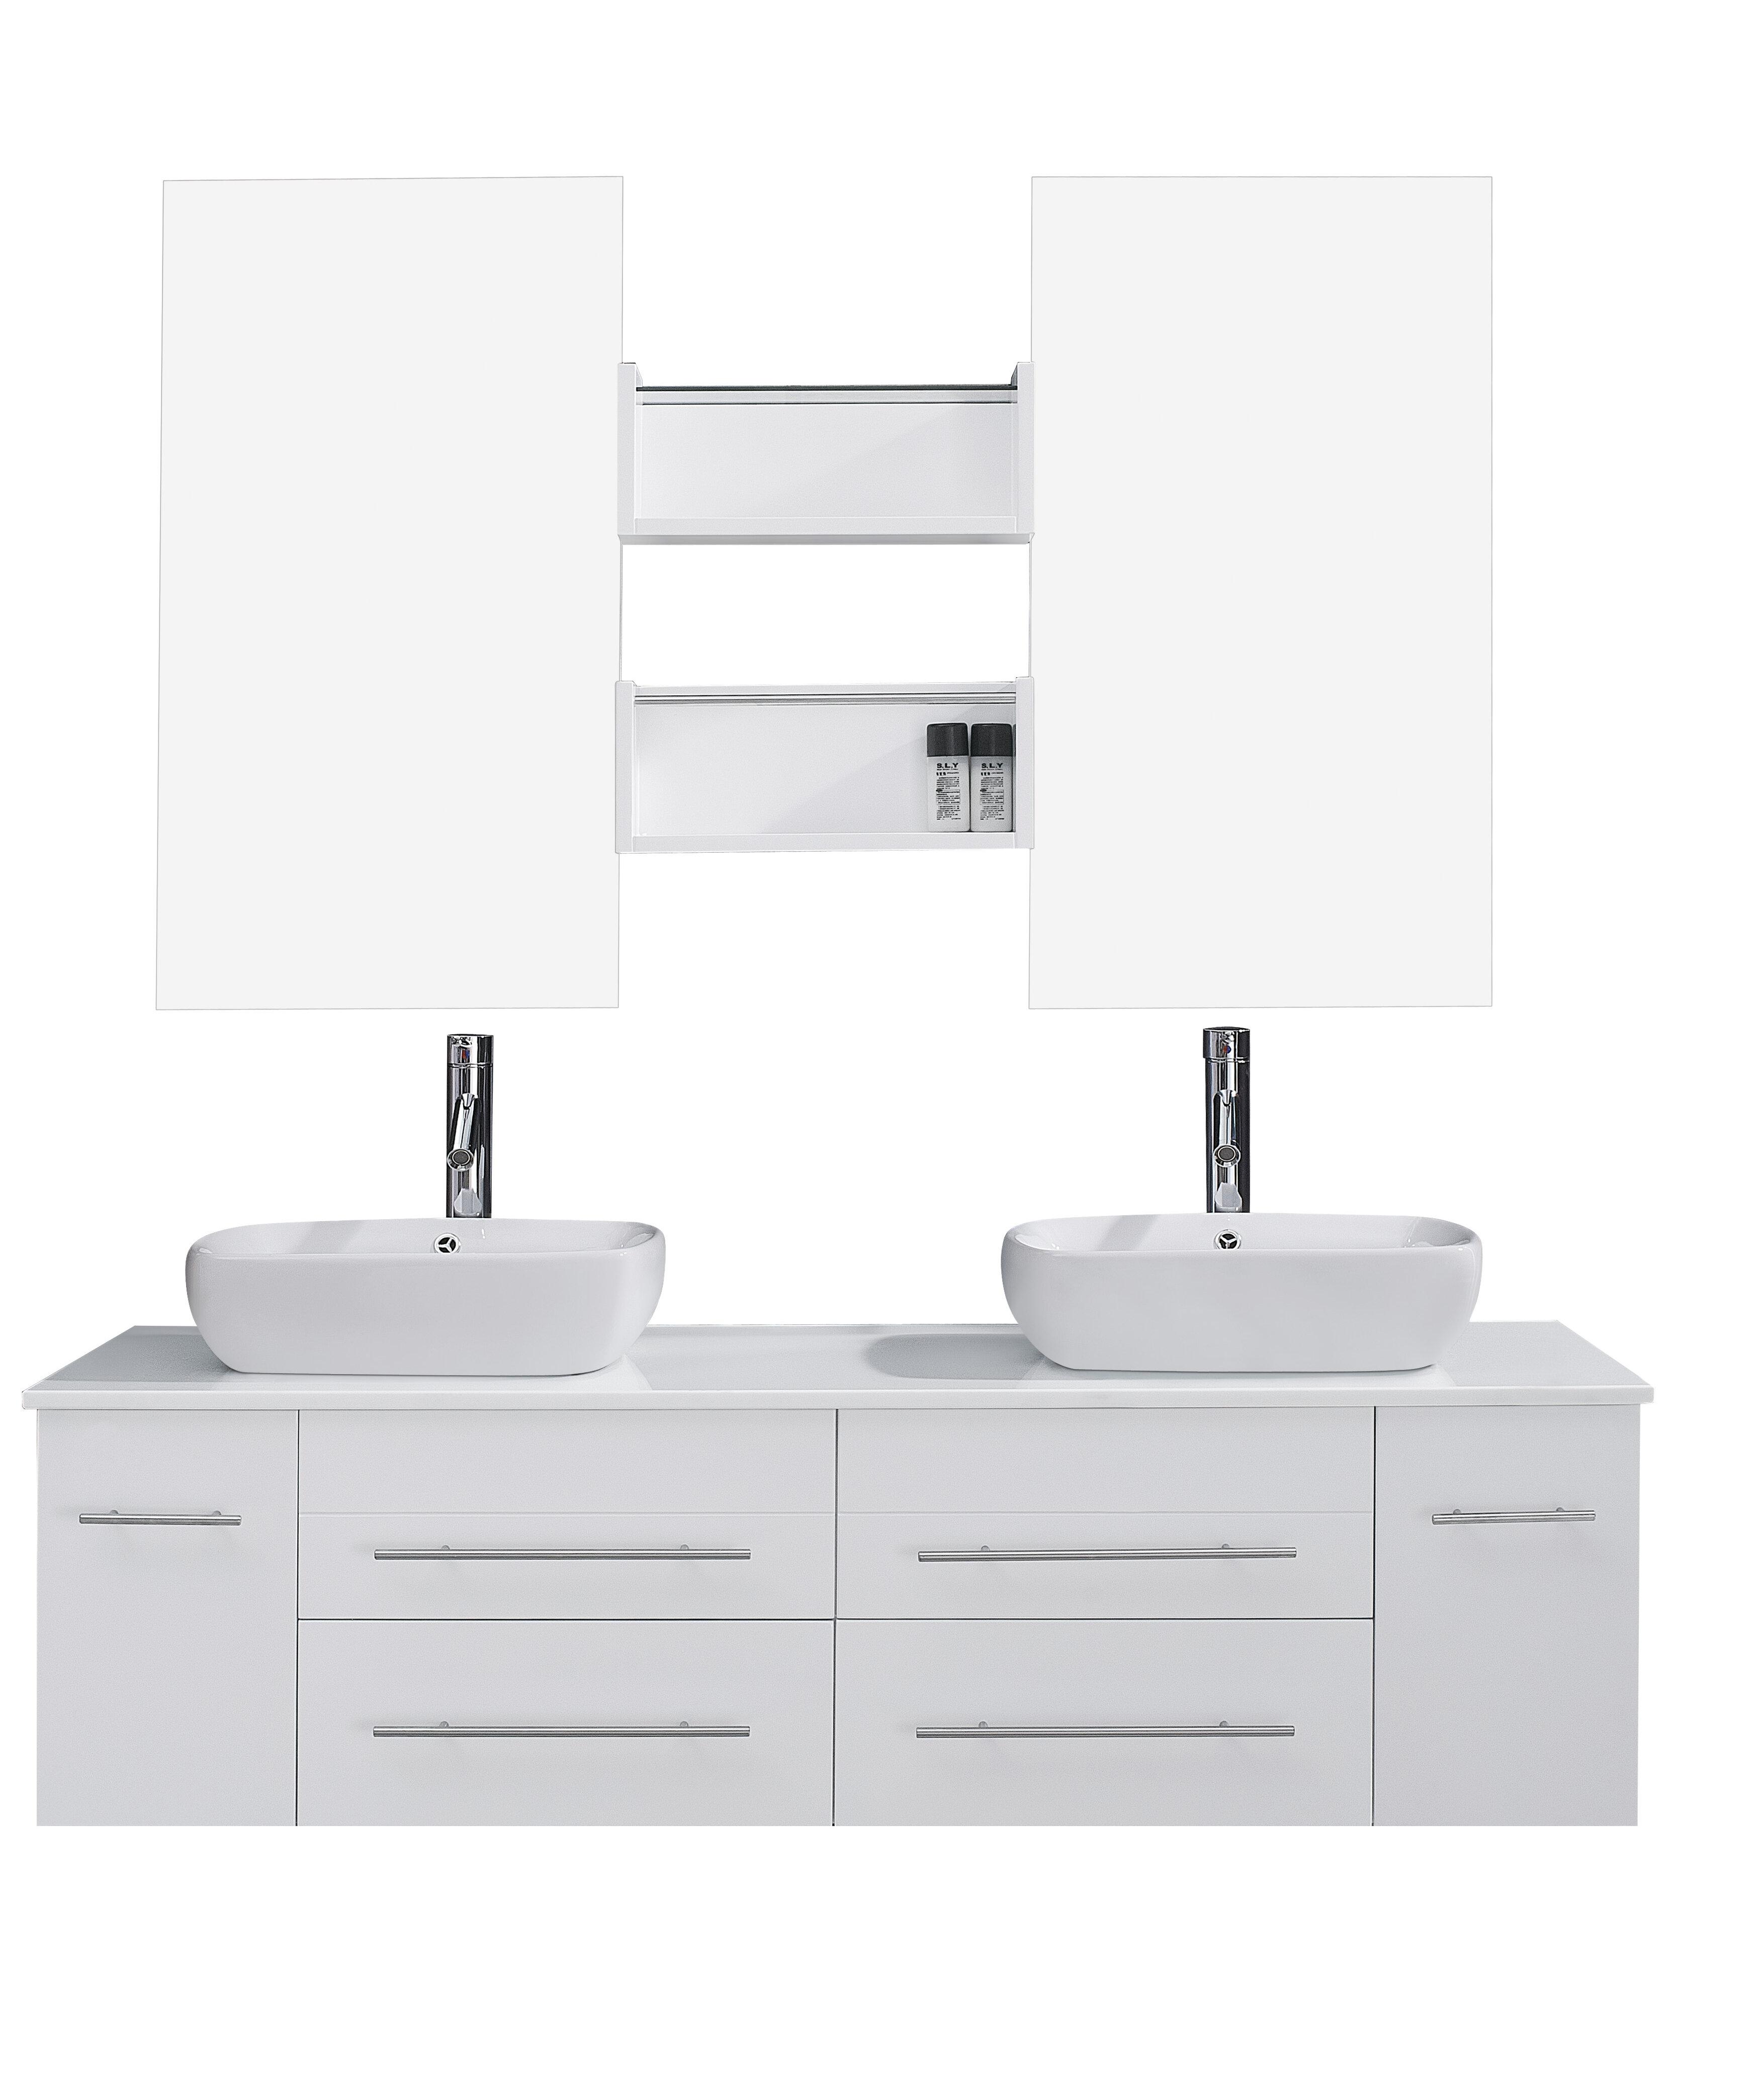 Virtu Usa Ultra Modern Series 60 Double Bathroom Vanity